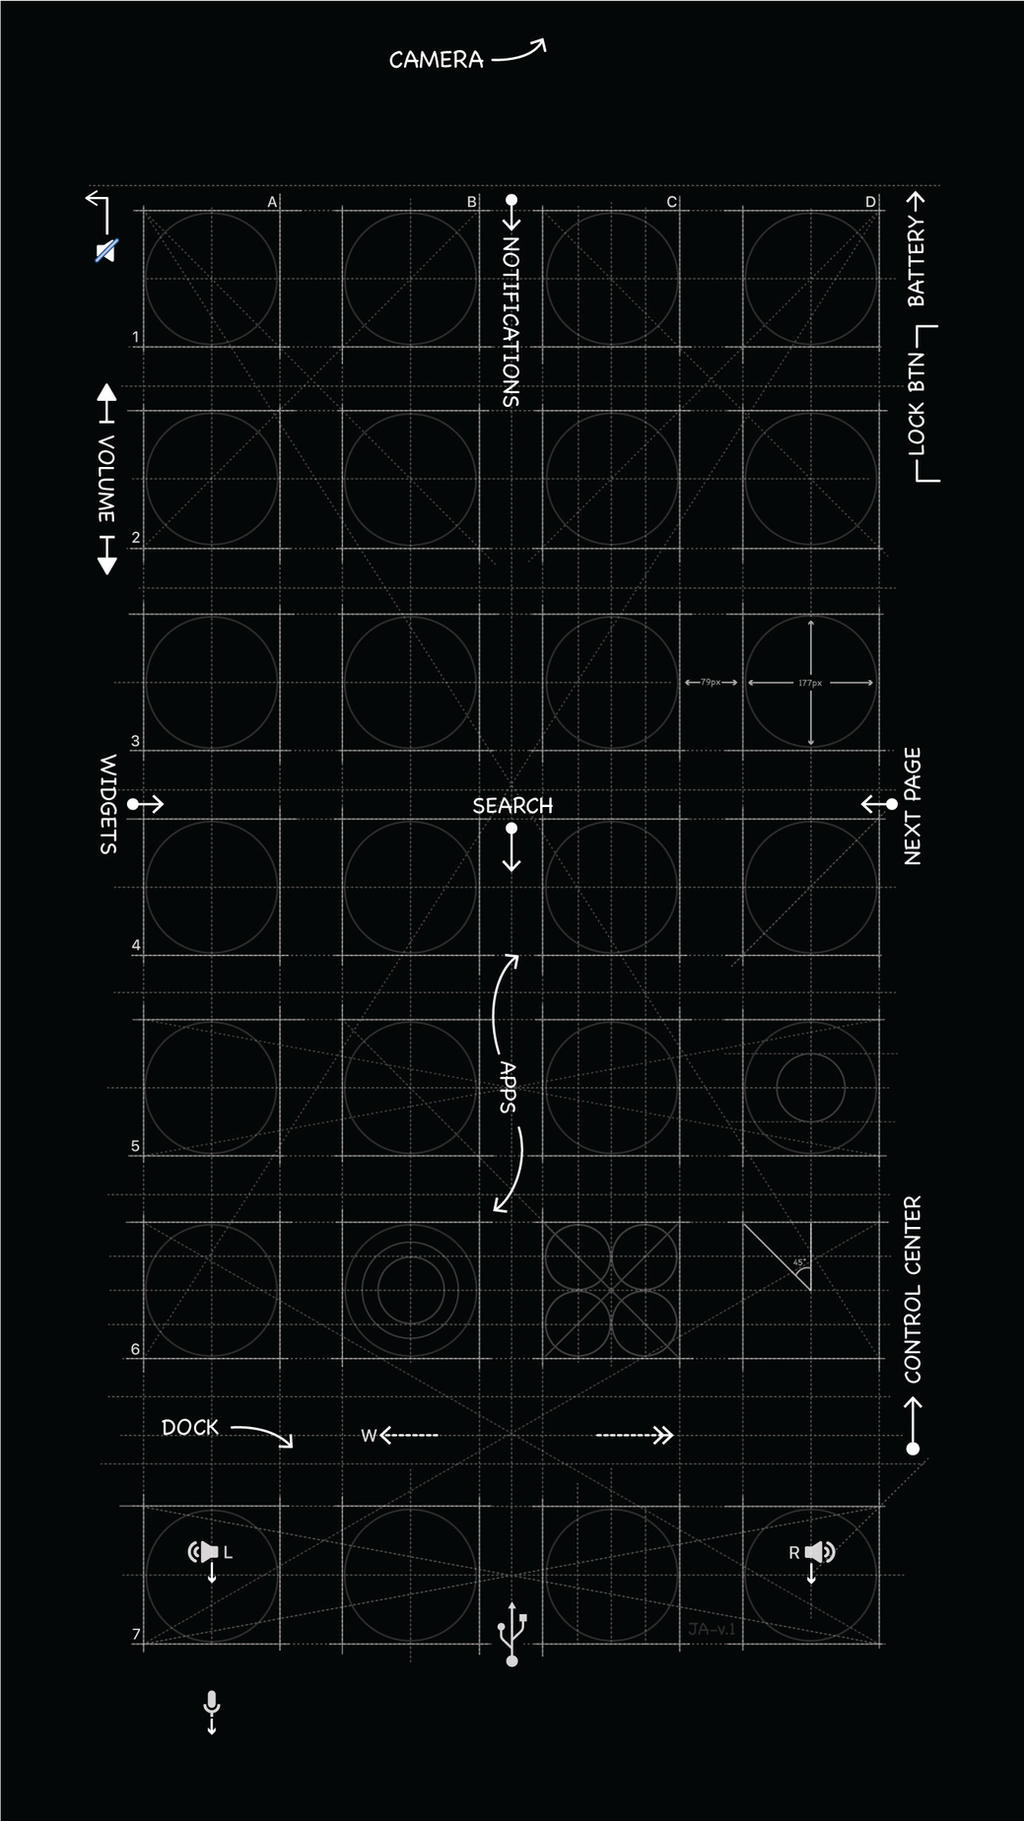 Iphone x blueprint wallpaper by mrdude42 on deviantart blueprint iphone6 8 wallpaper by mrdude42 malvernweather Gallery